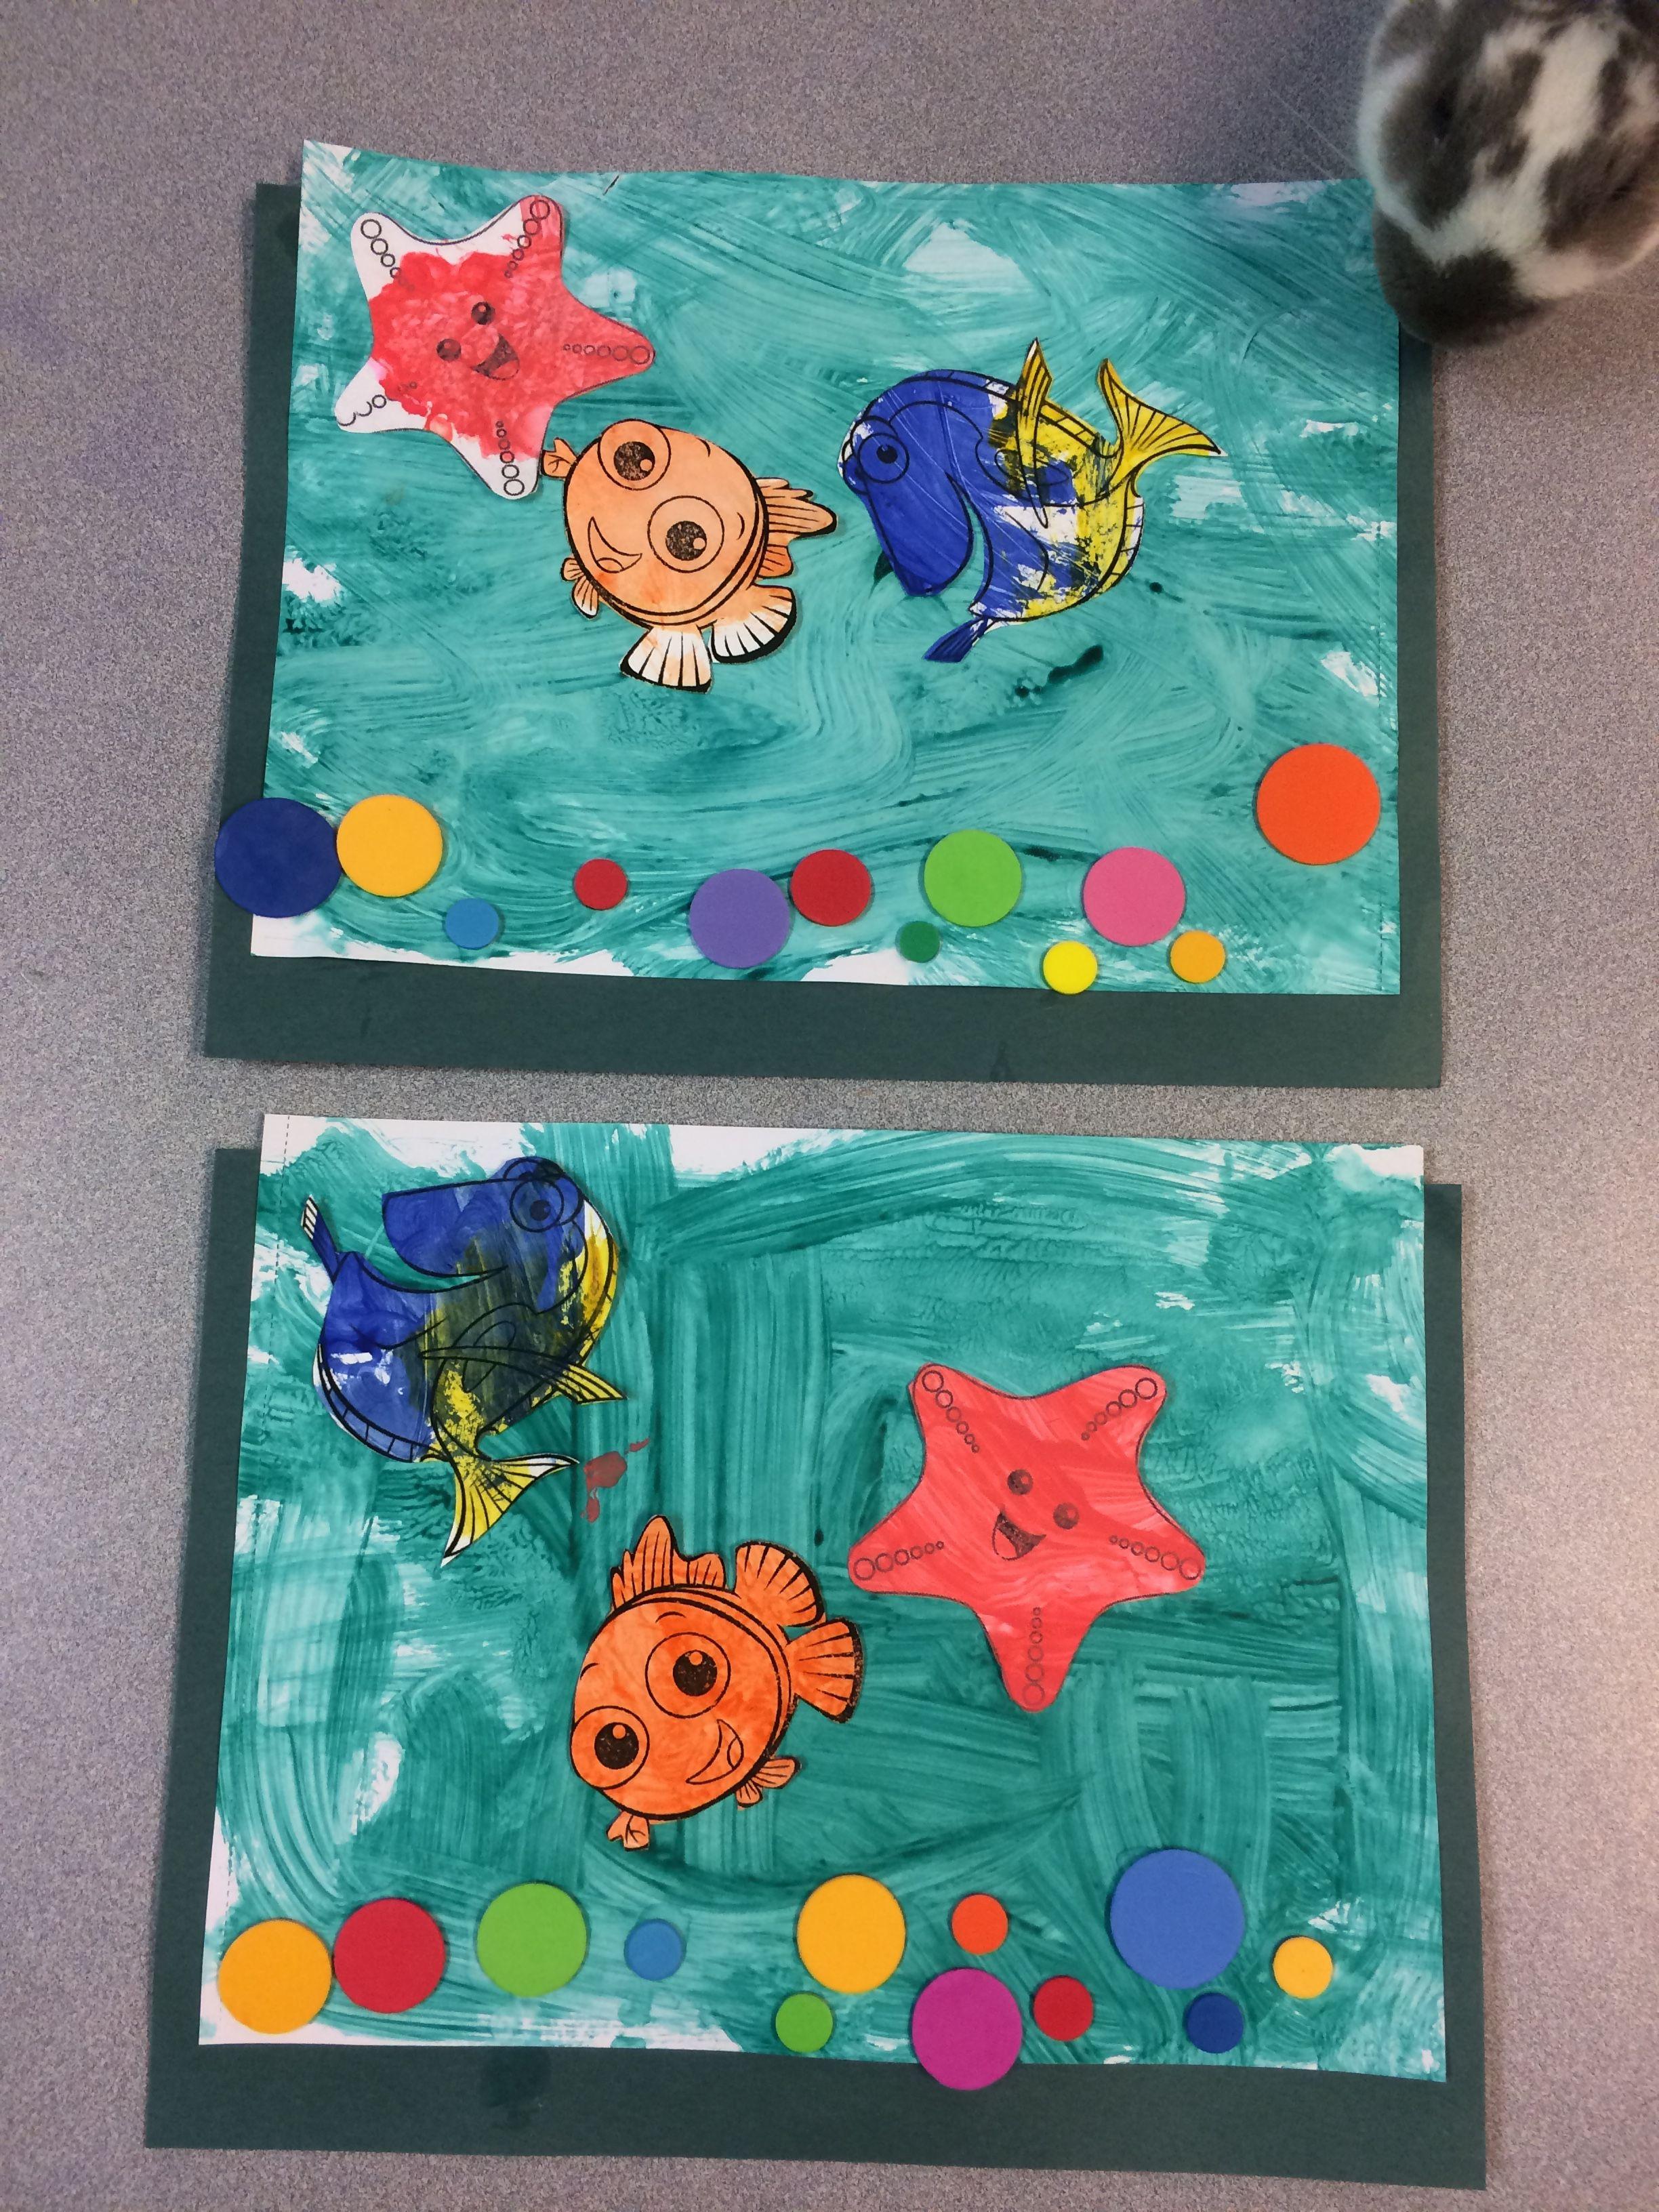 Finding Nemo Dory Fish Tank Aquarium Craft Art Project